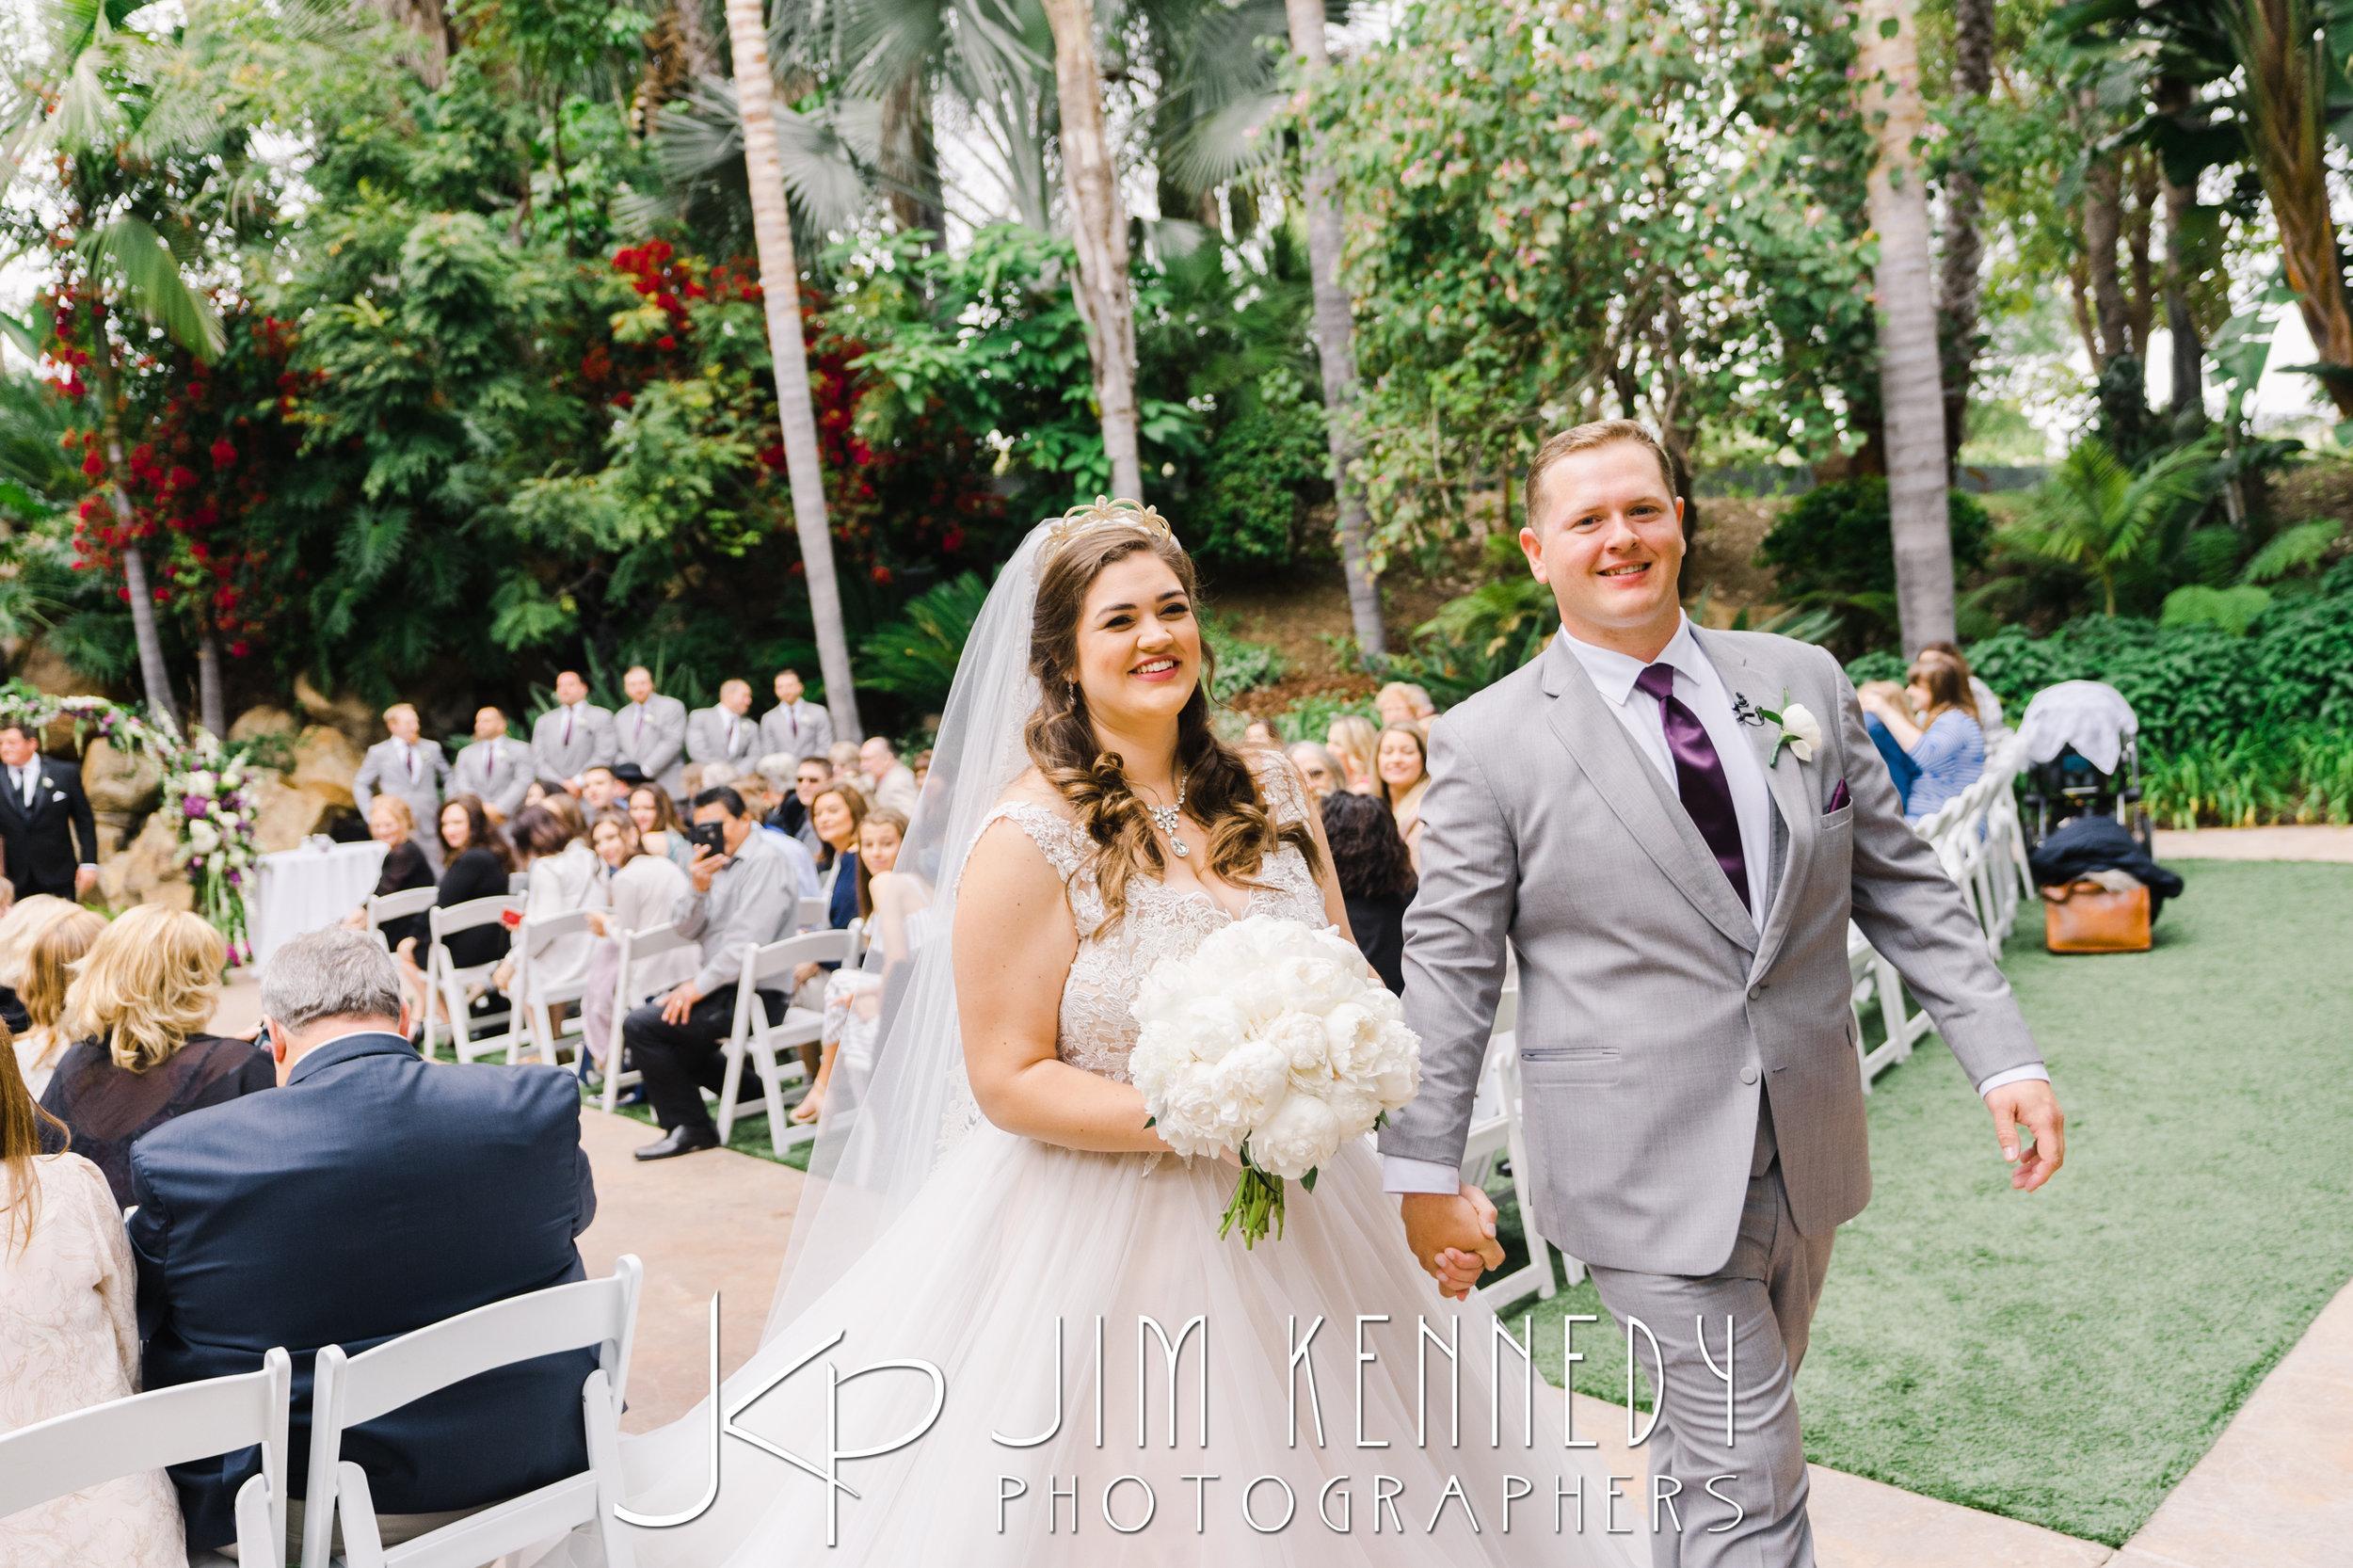 grand-tradition-Lauren-Ryan__0101.JPG